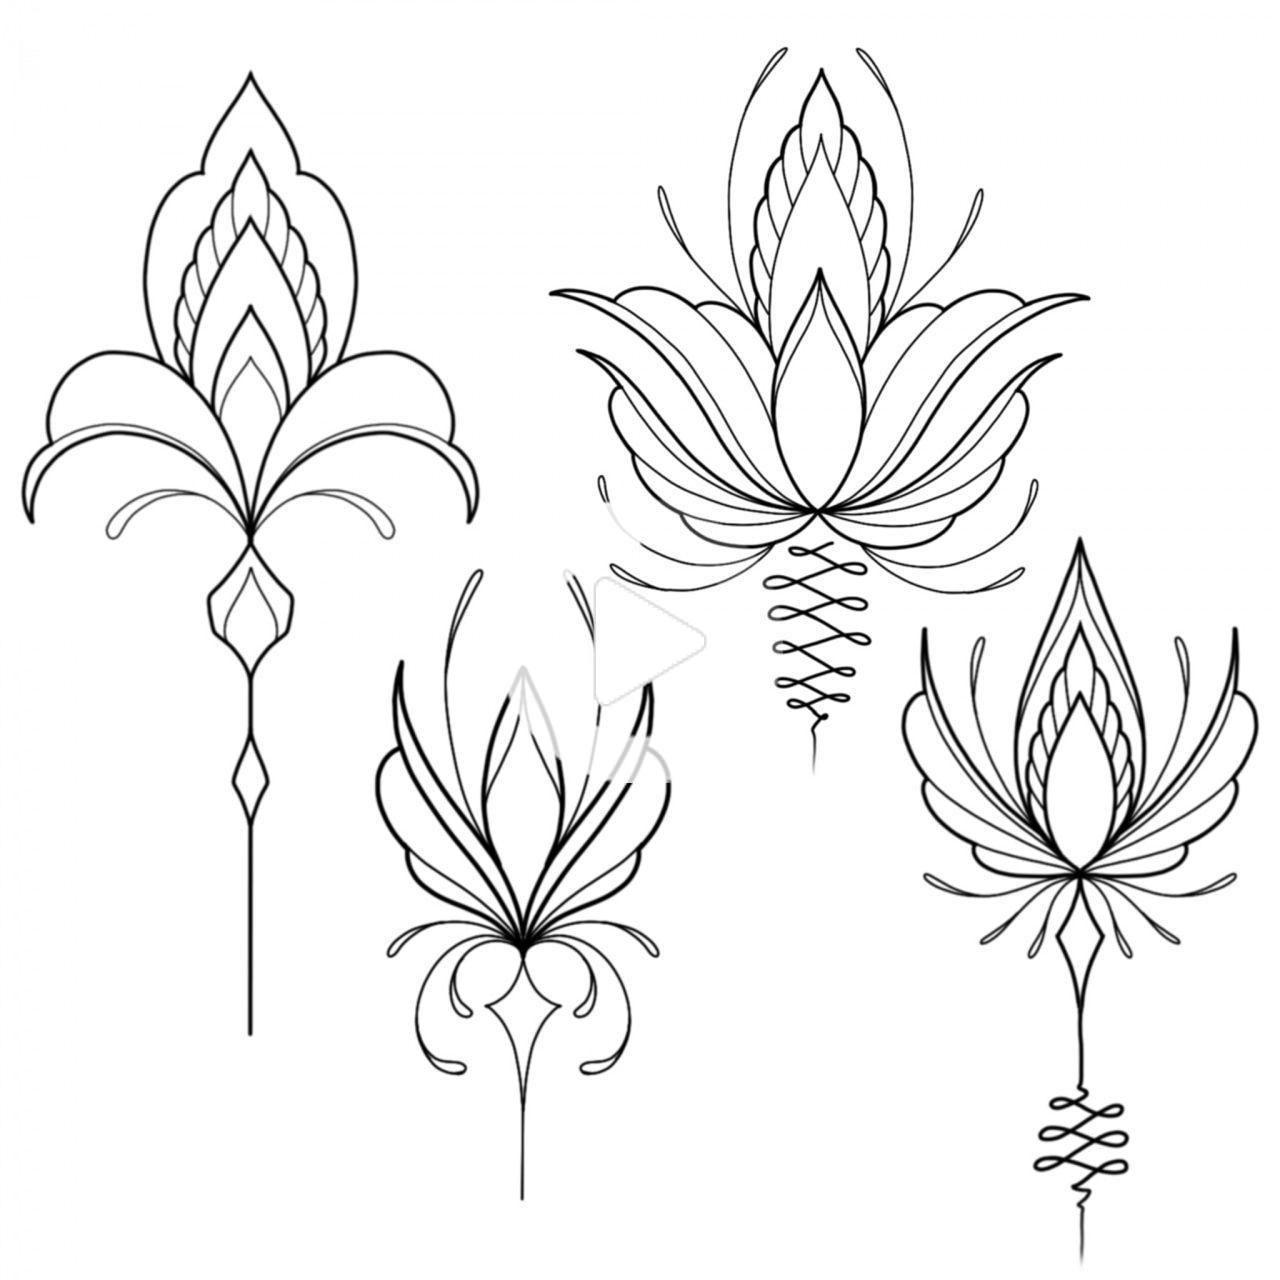 Ornamental tattoo on sketch (on paper) by Kolya Gagarin in 2020   Tatt